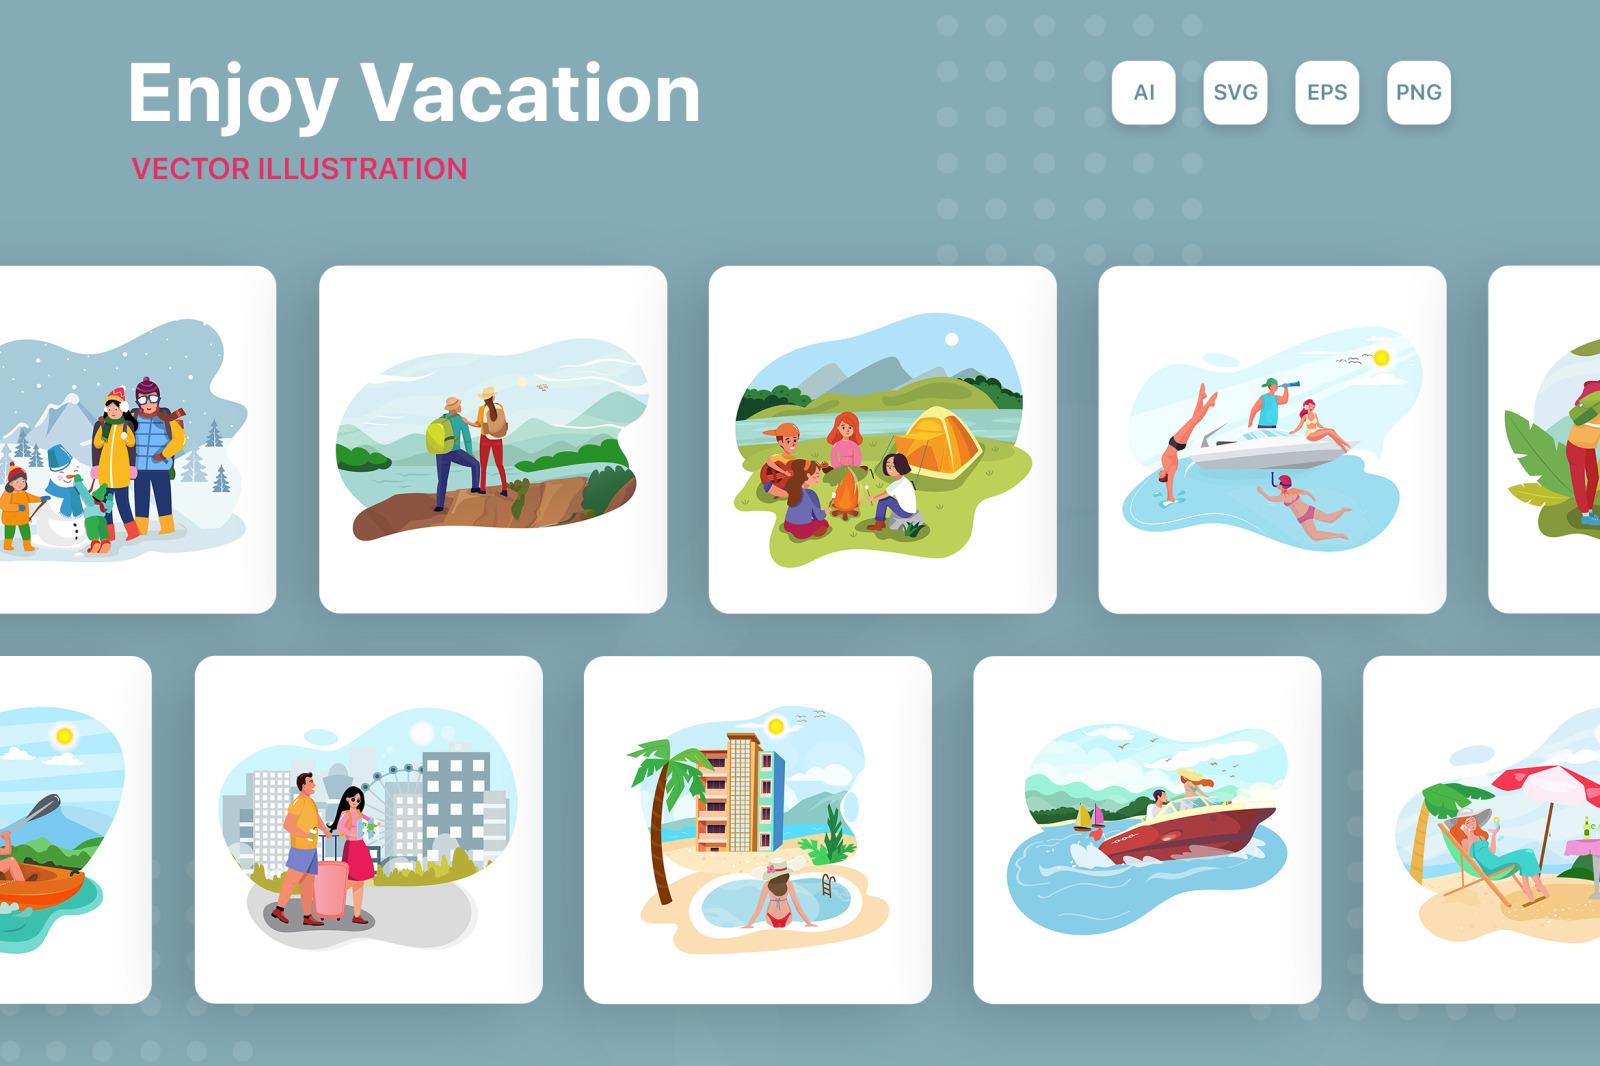 M171_ Enjoy Vacation Illustrations